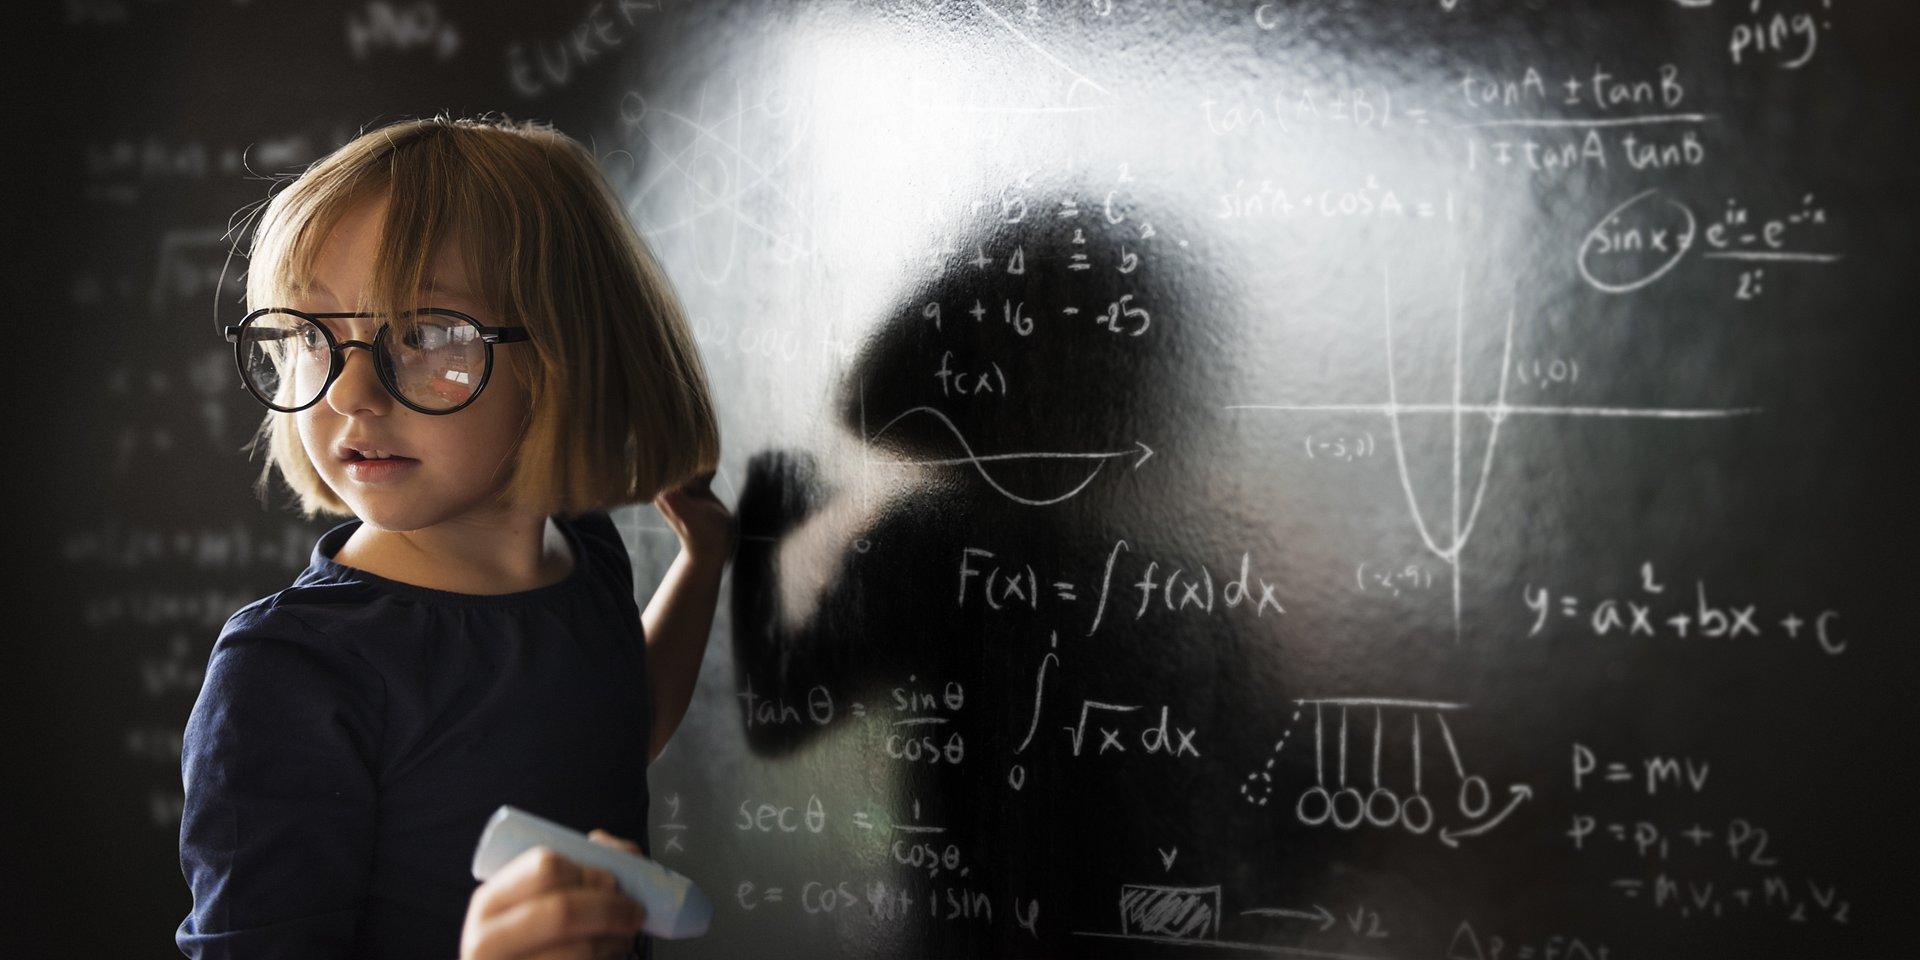 Network Design University. Class #1 – Networking. Start small… think big!